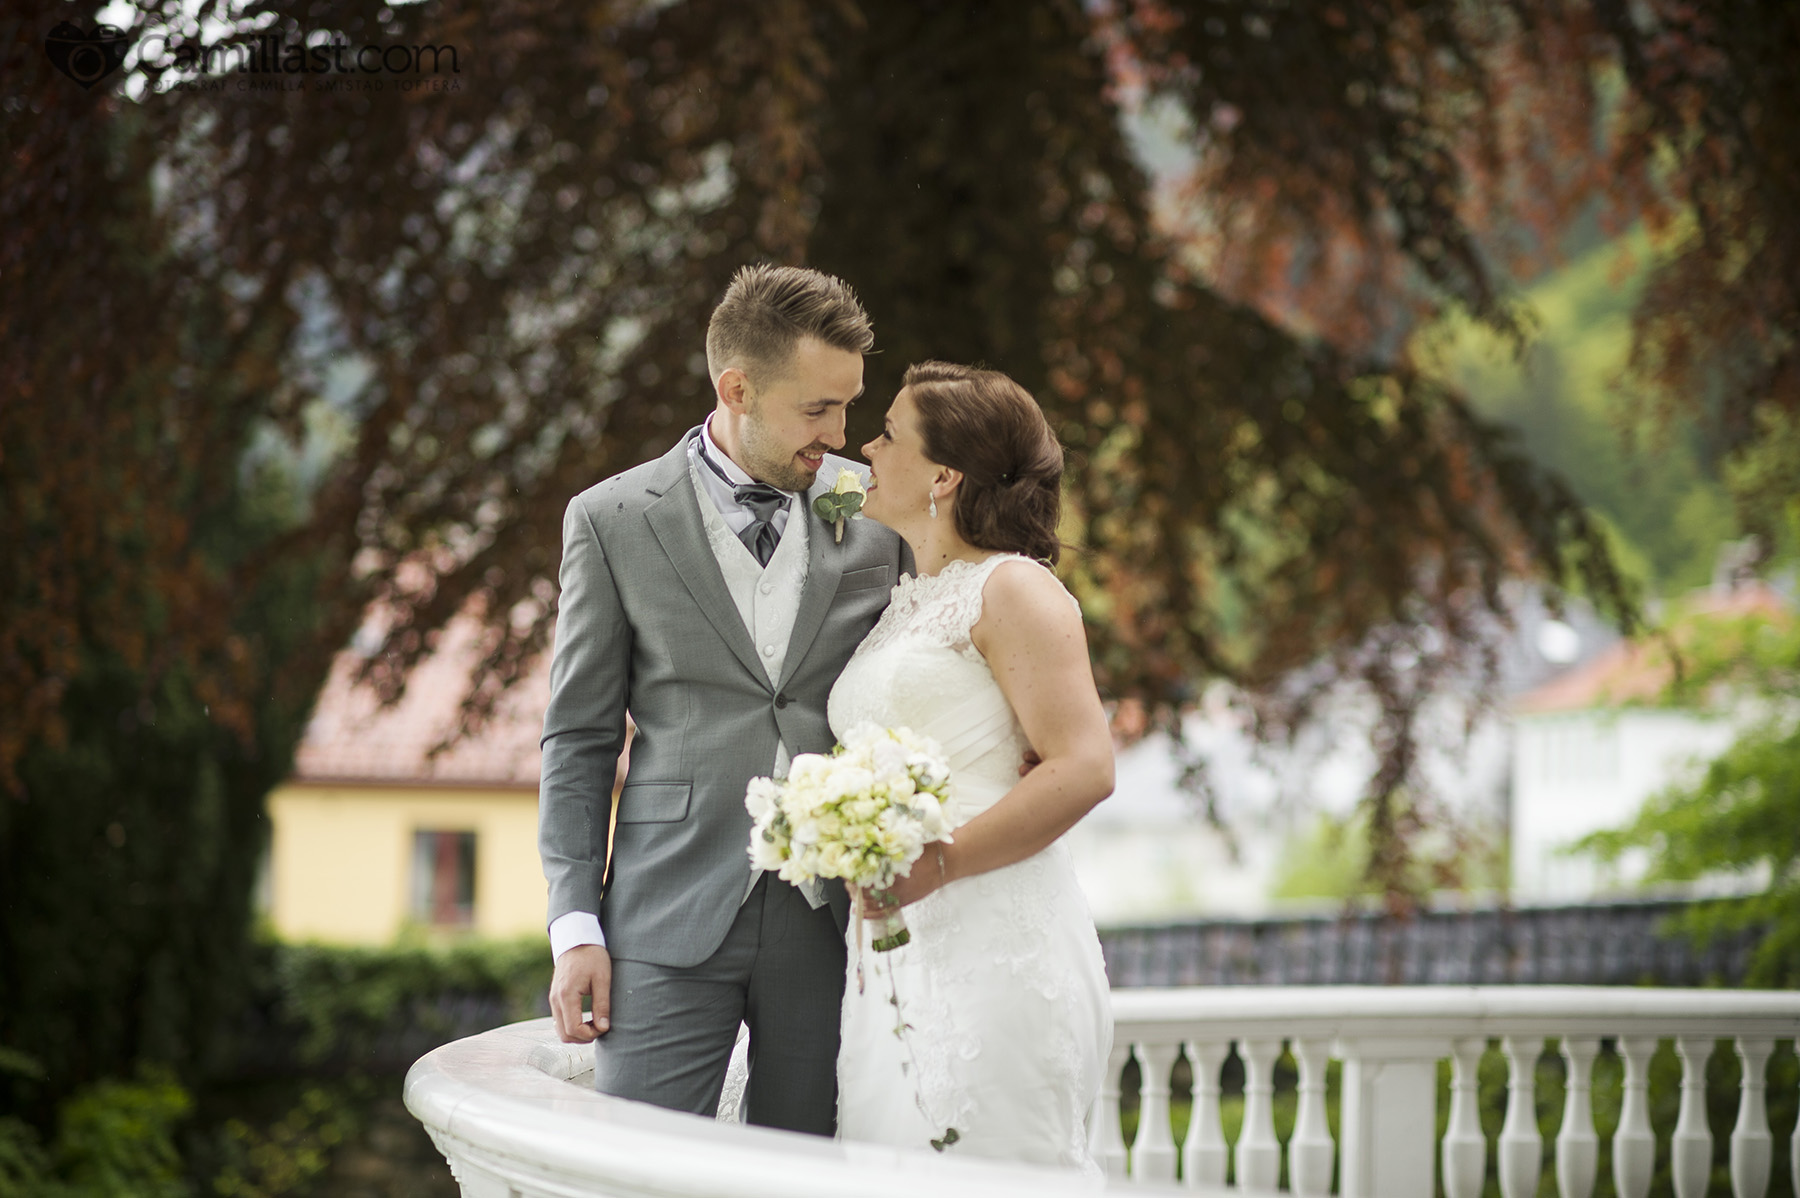 christinegården bergen vielse bryllup